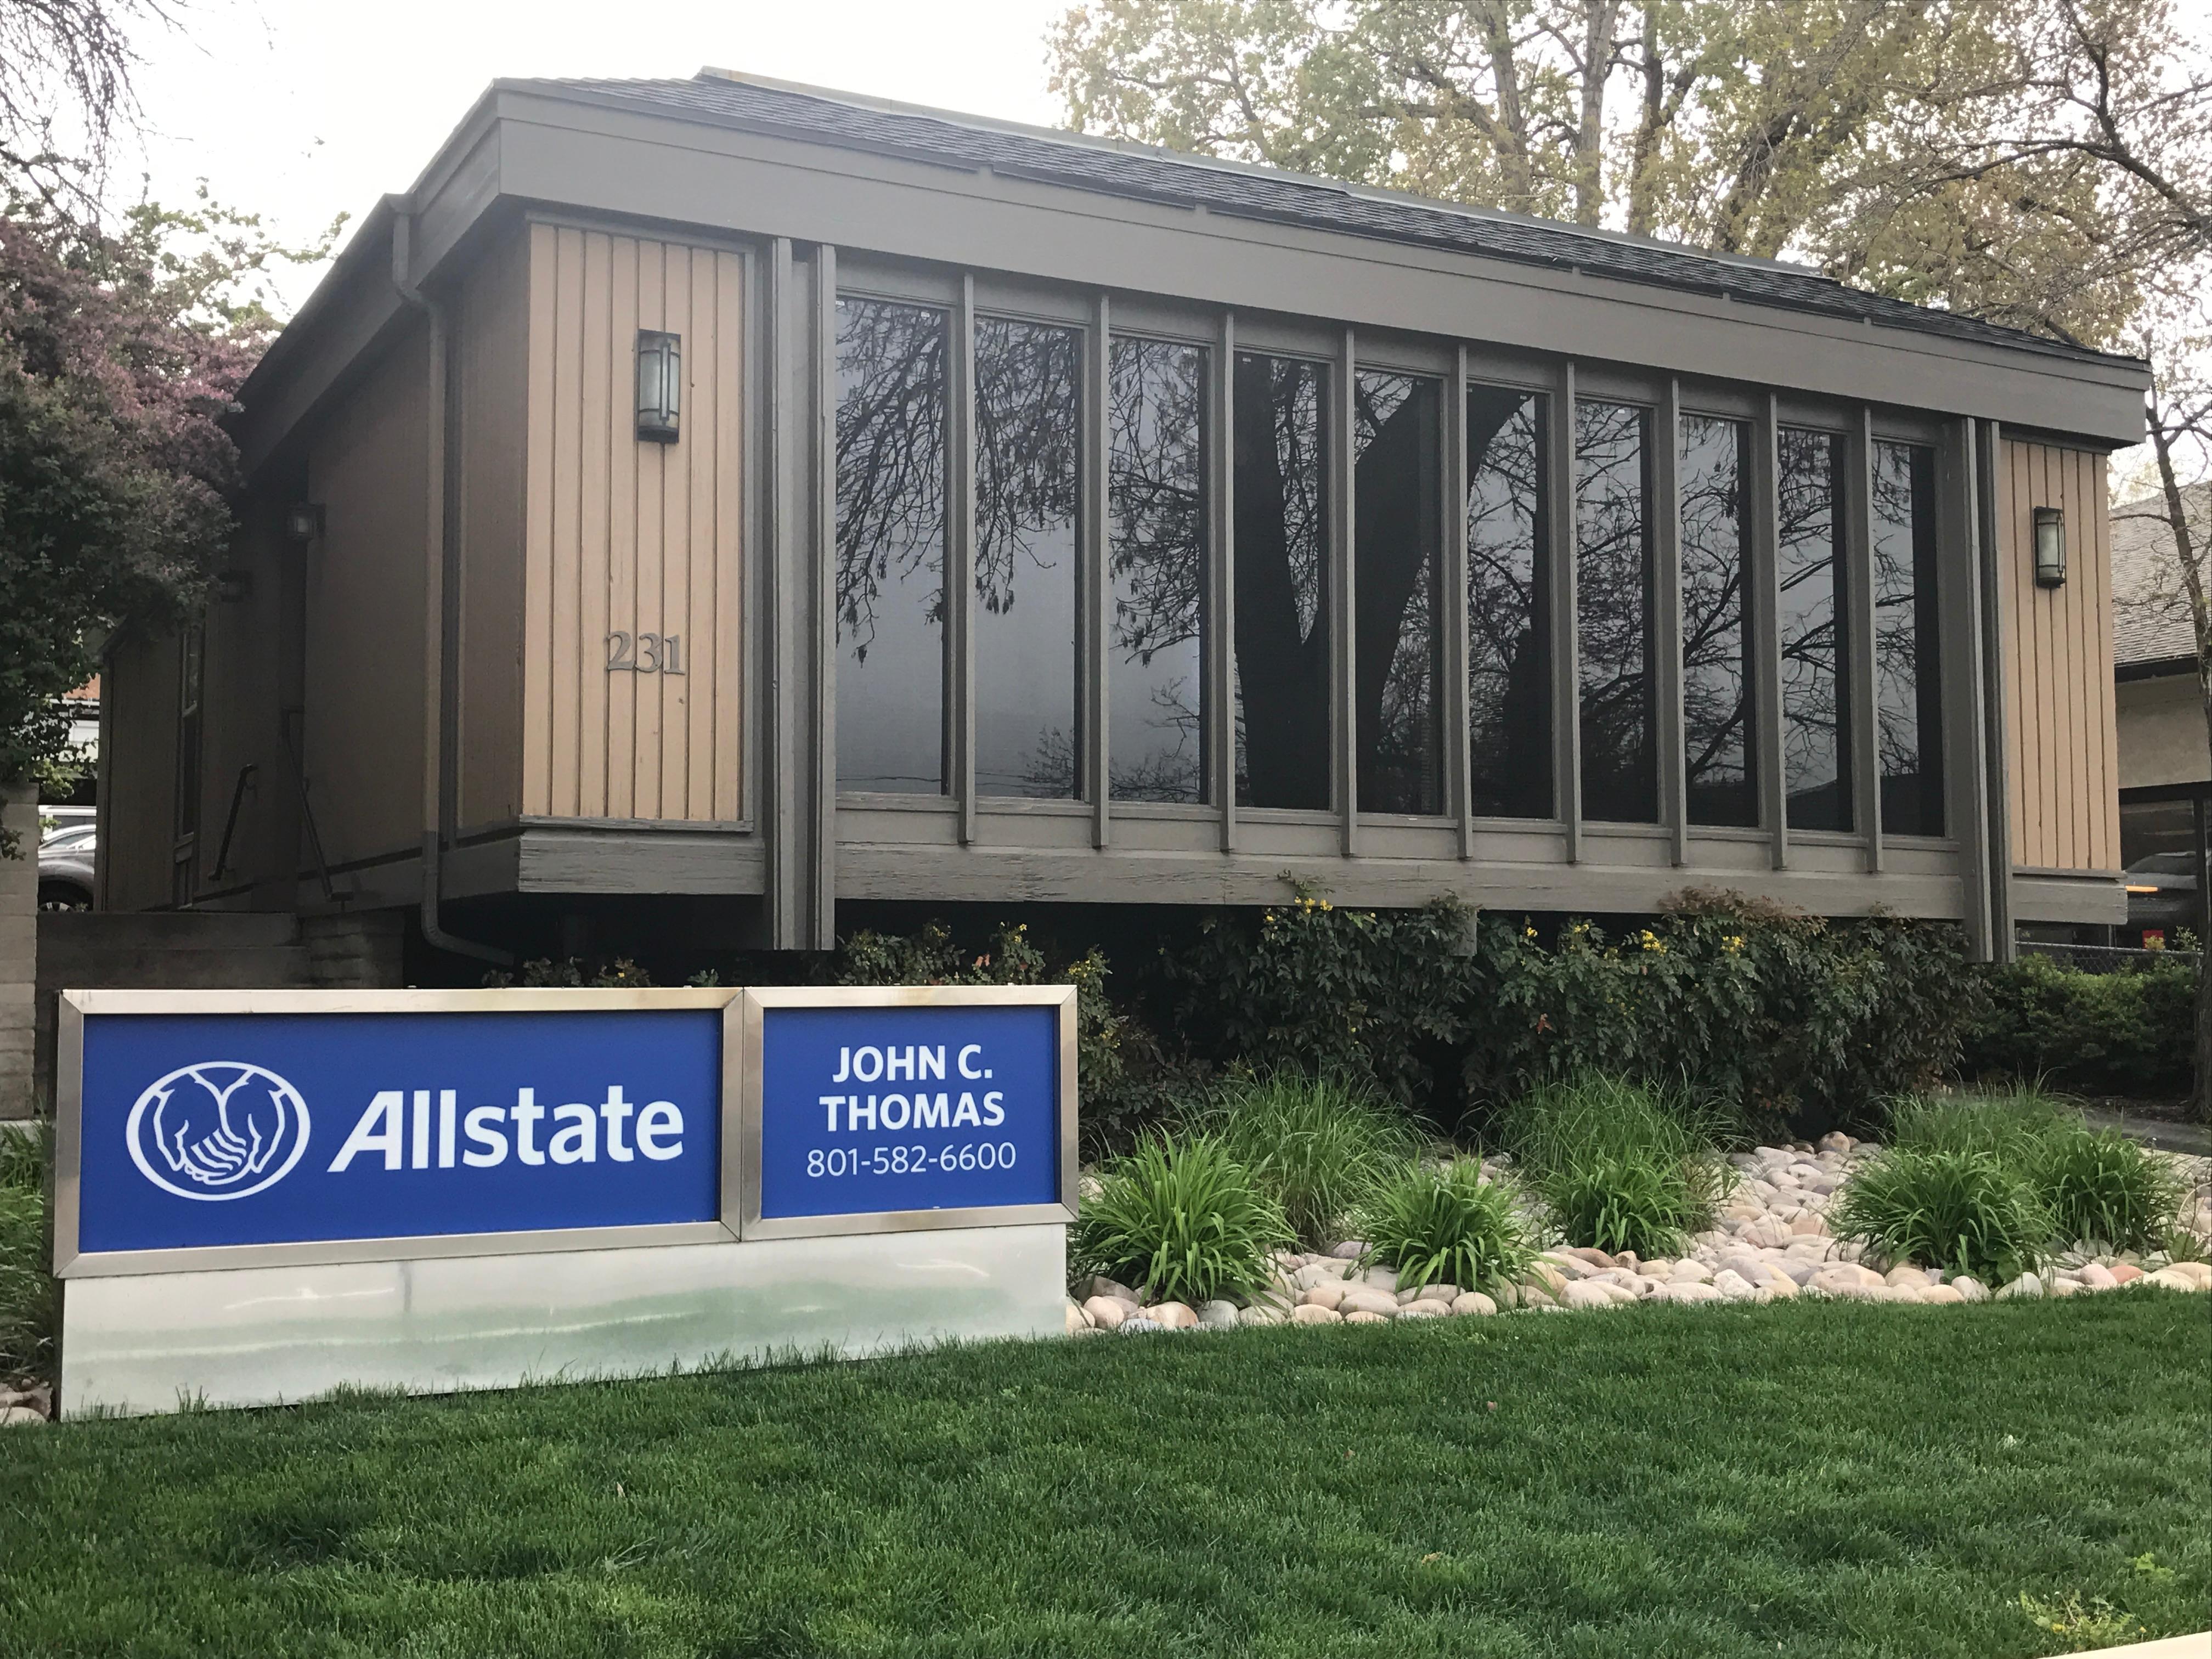 John C. Thomas: Allstate Insurance image 2